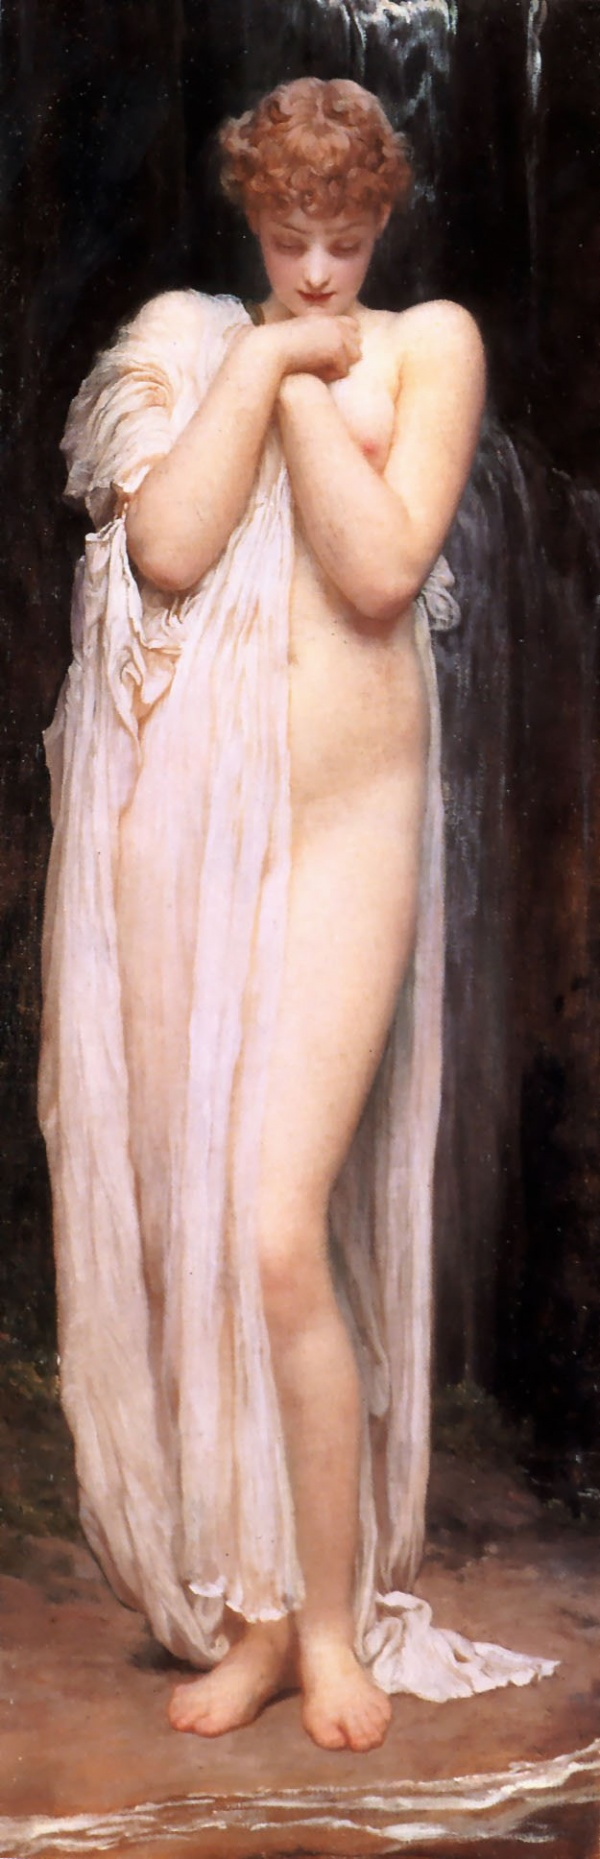 Английский художник Фредерик Лейтон (Lord Frederick Leighton) (116 фото)